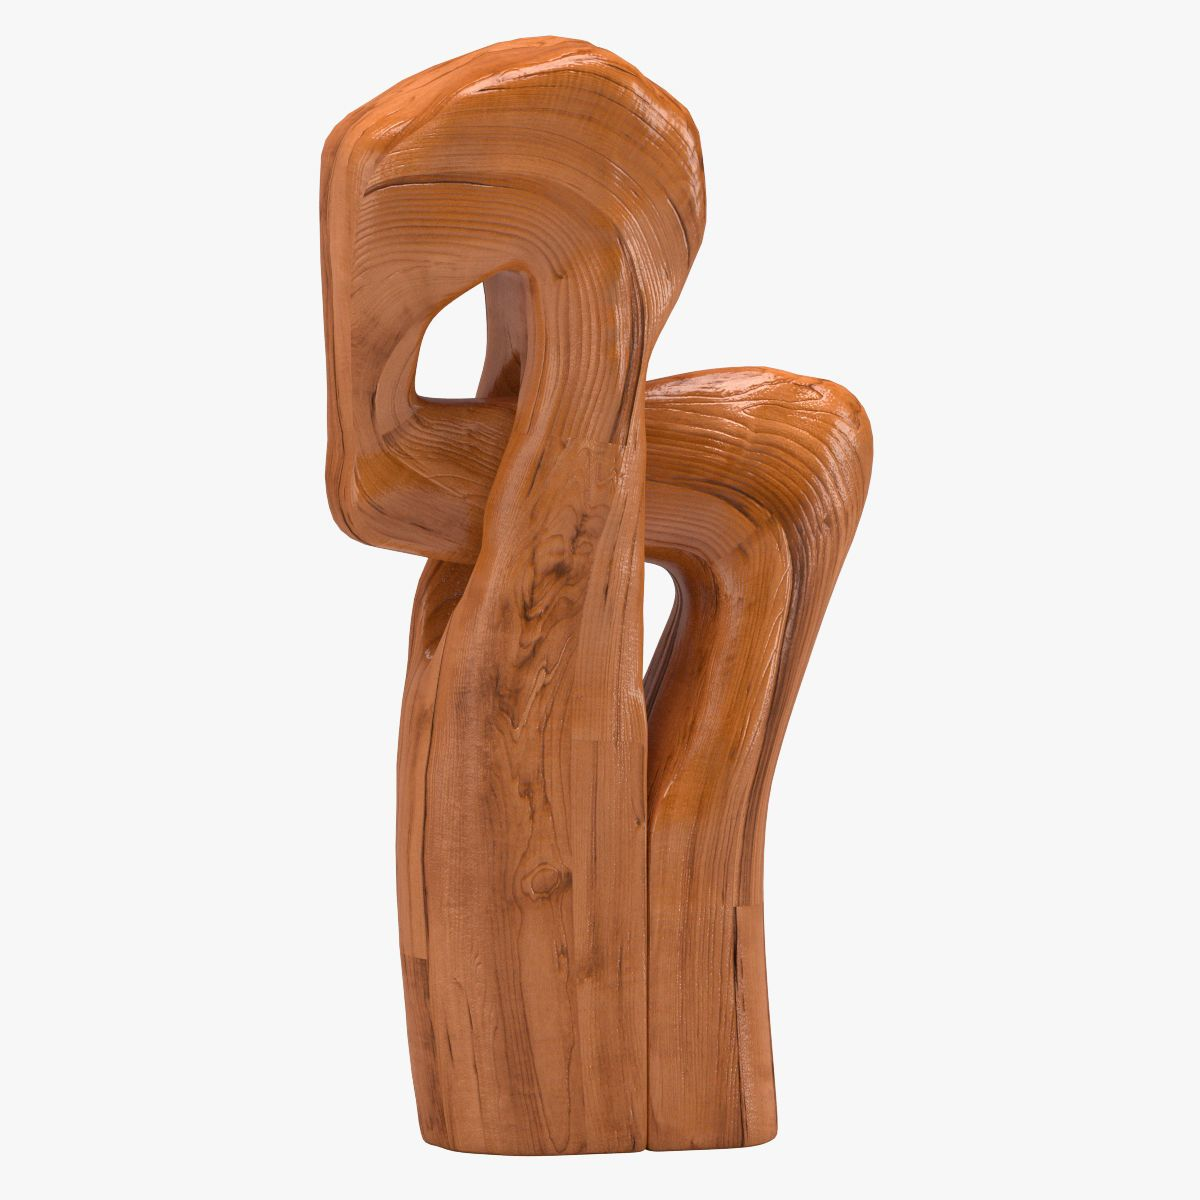 Oaken wooden figure sculpture d model in d household